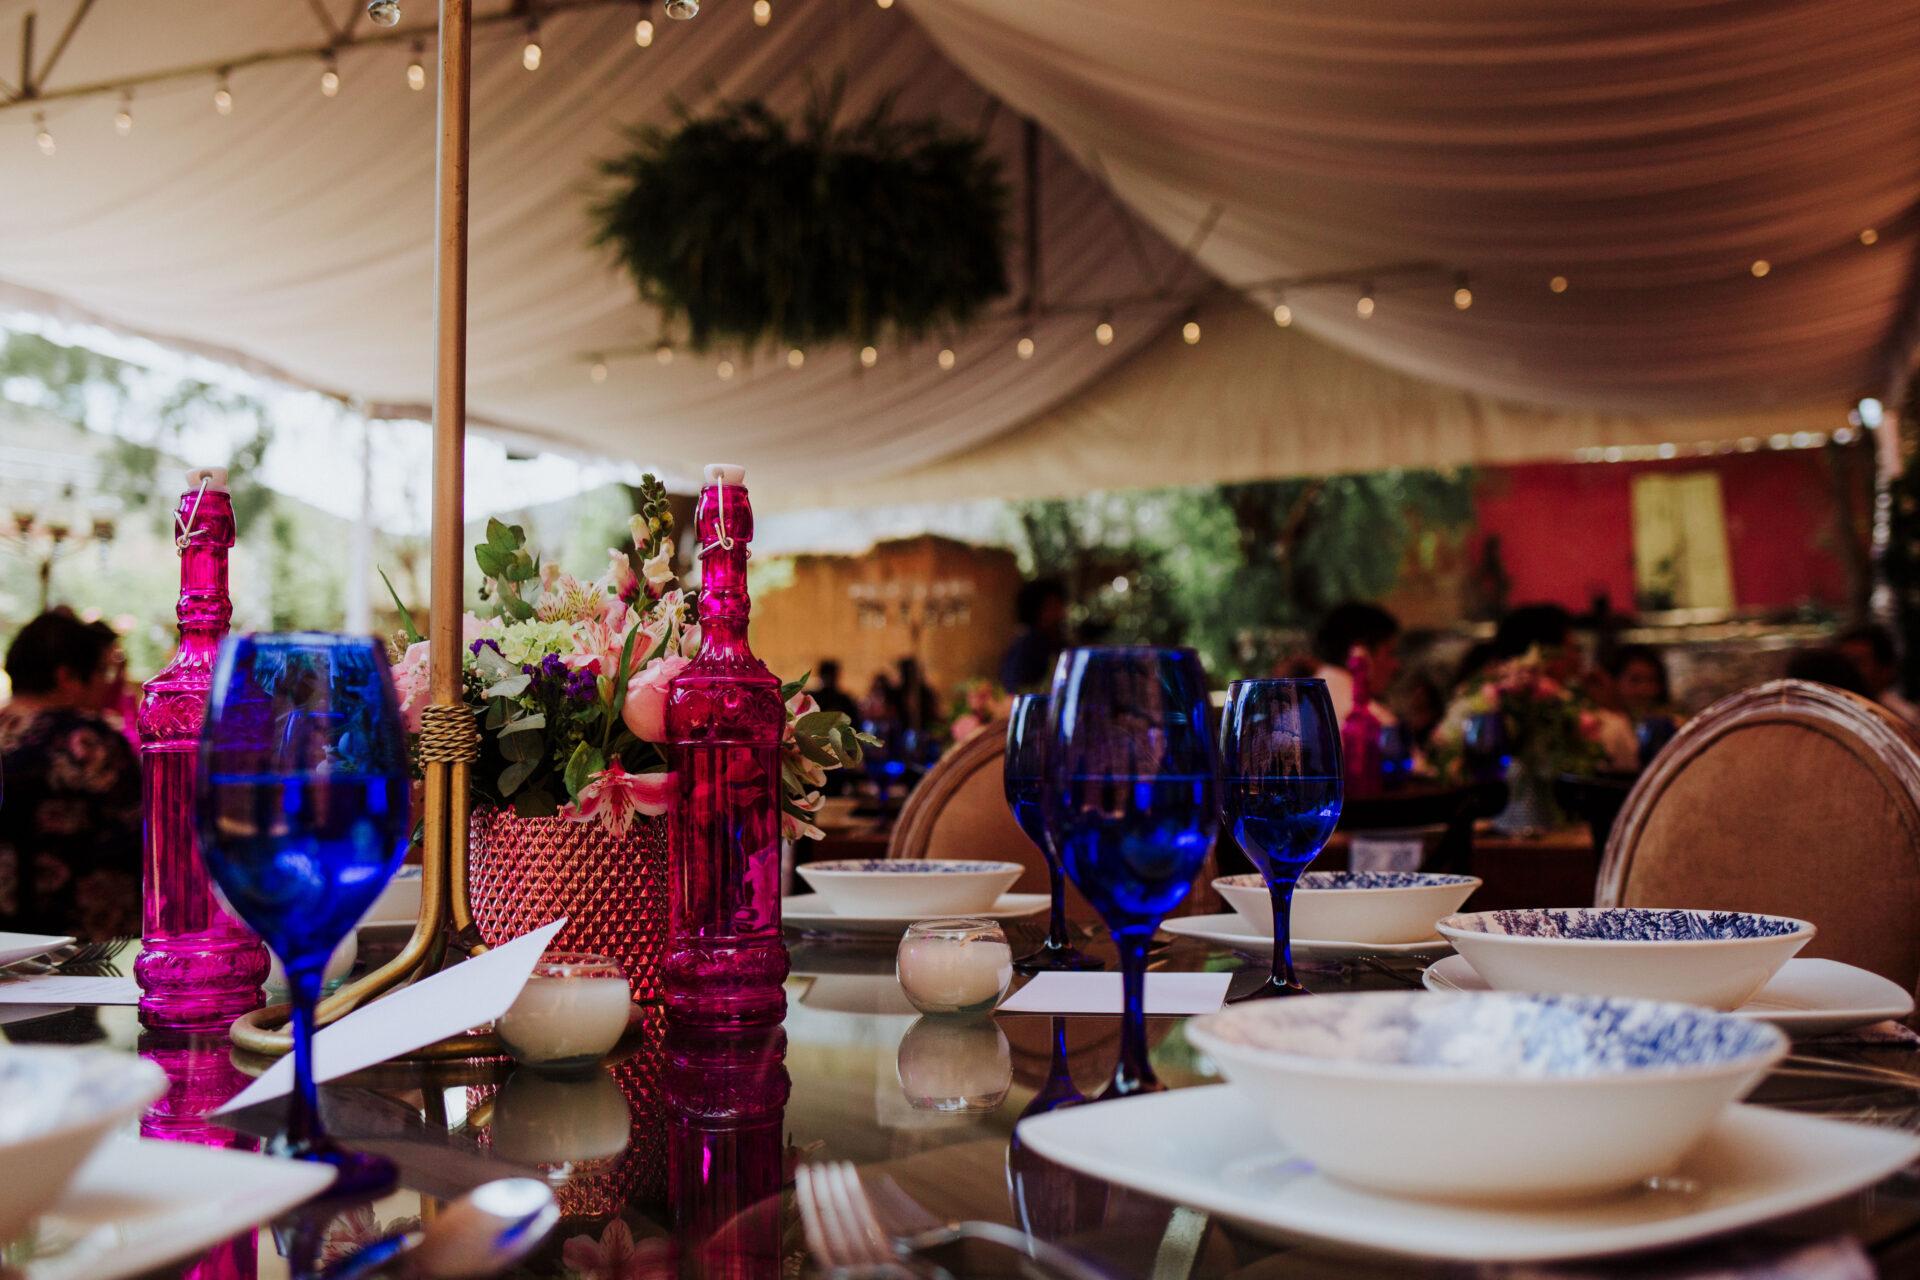 javier_noriega_fotografo_bodas_exhacienda_las_mercedes_zacatecas_wedding_photographer9a